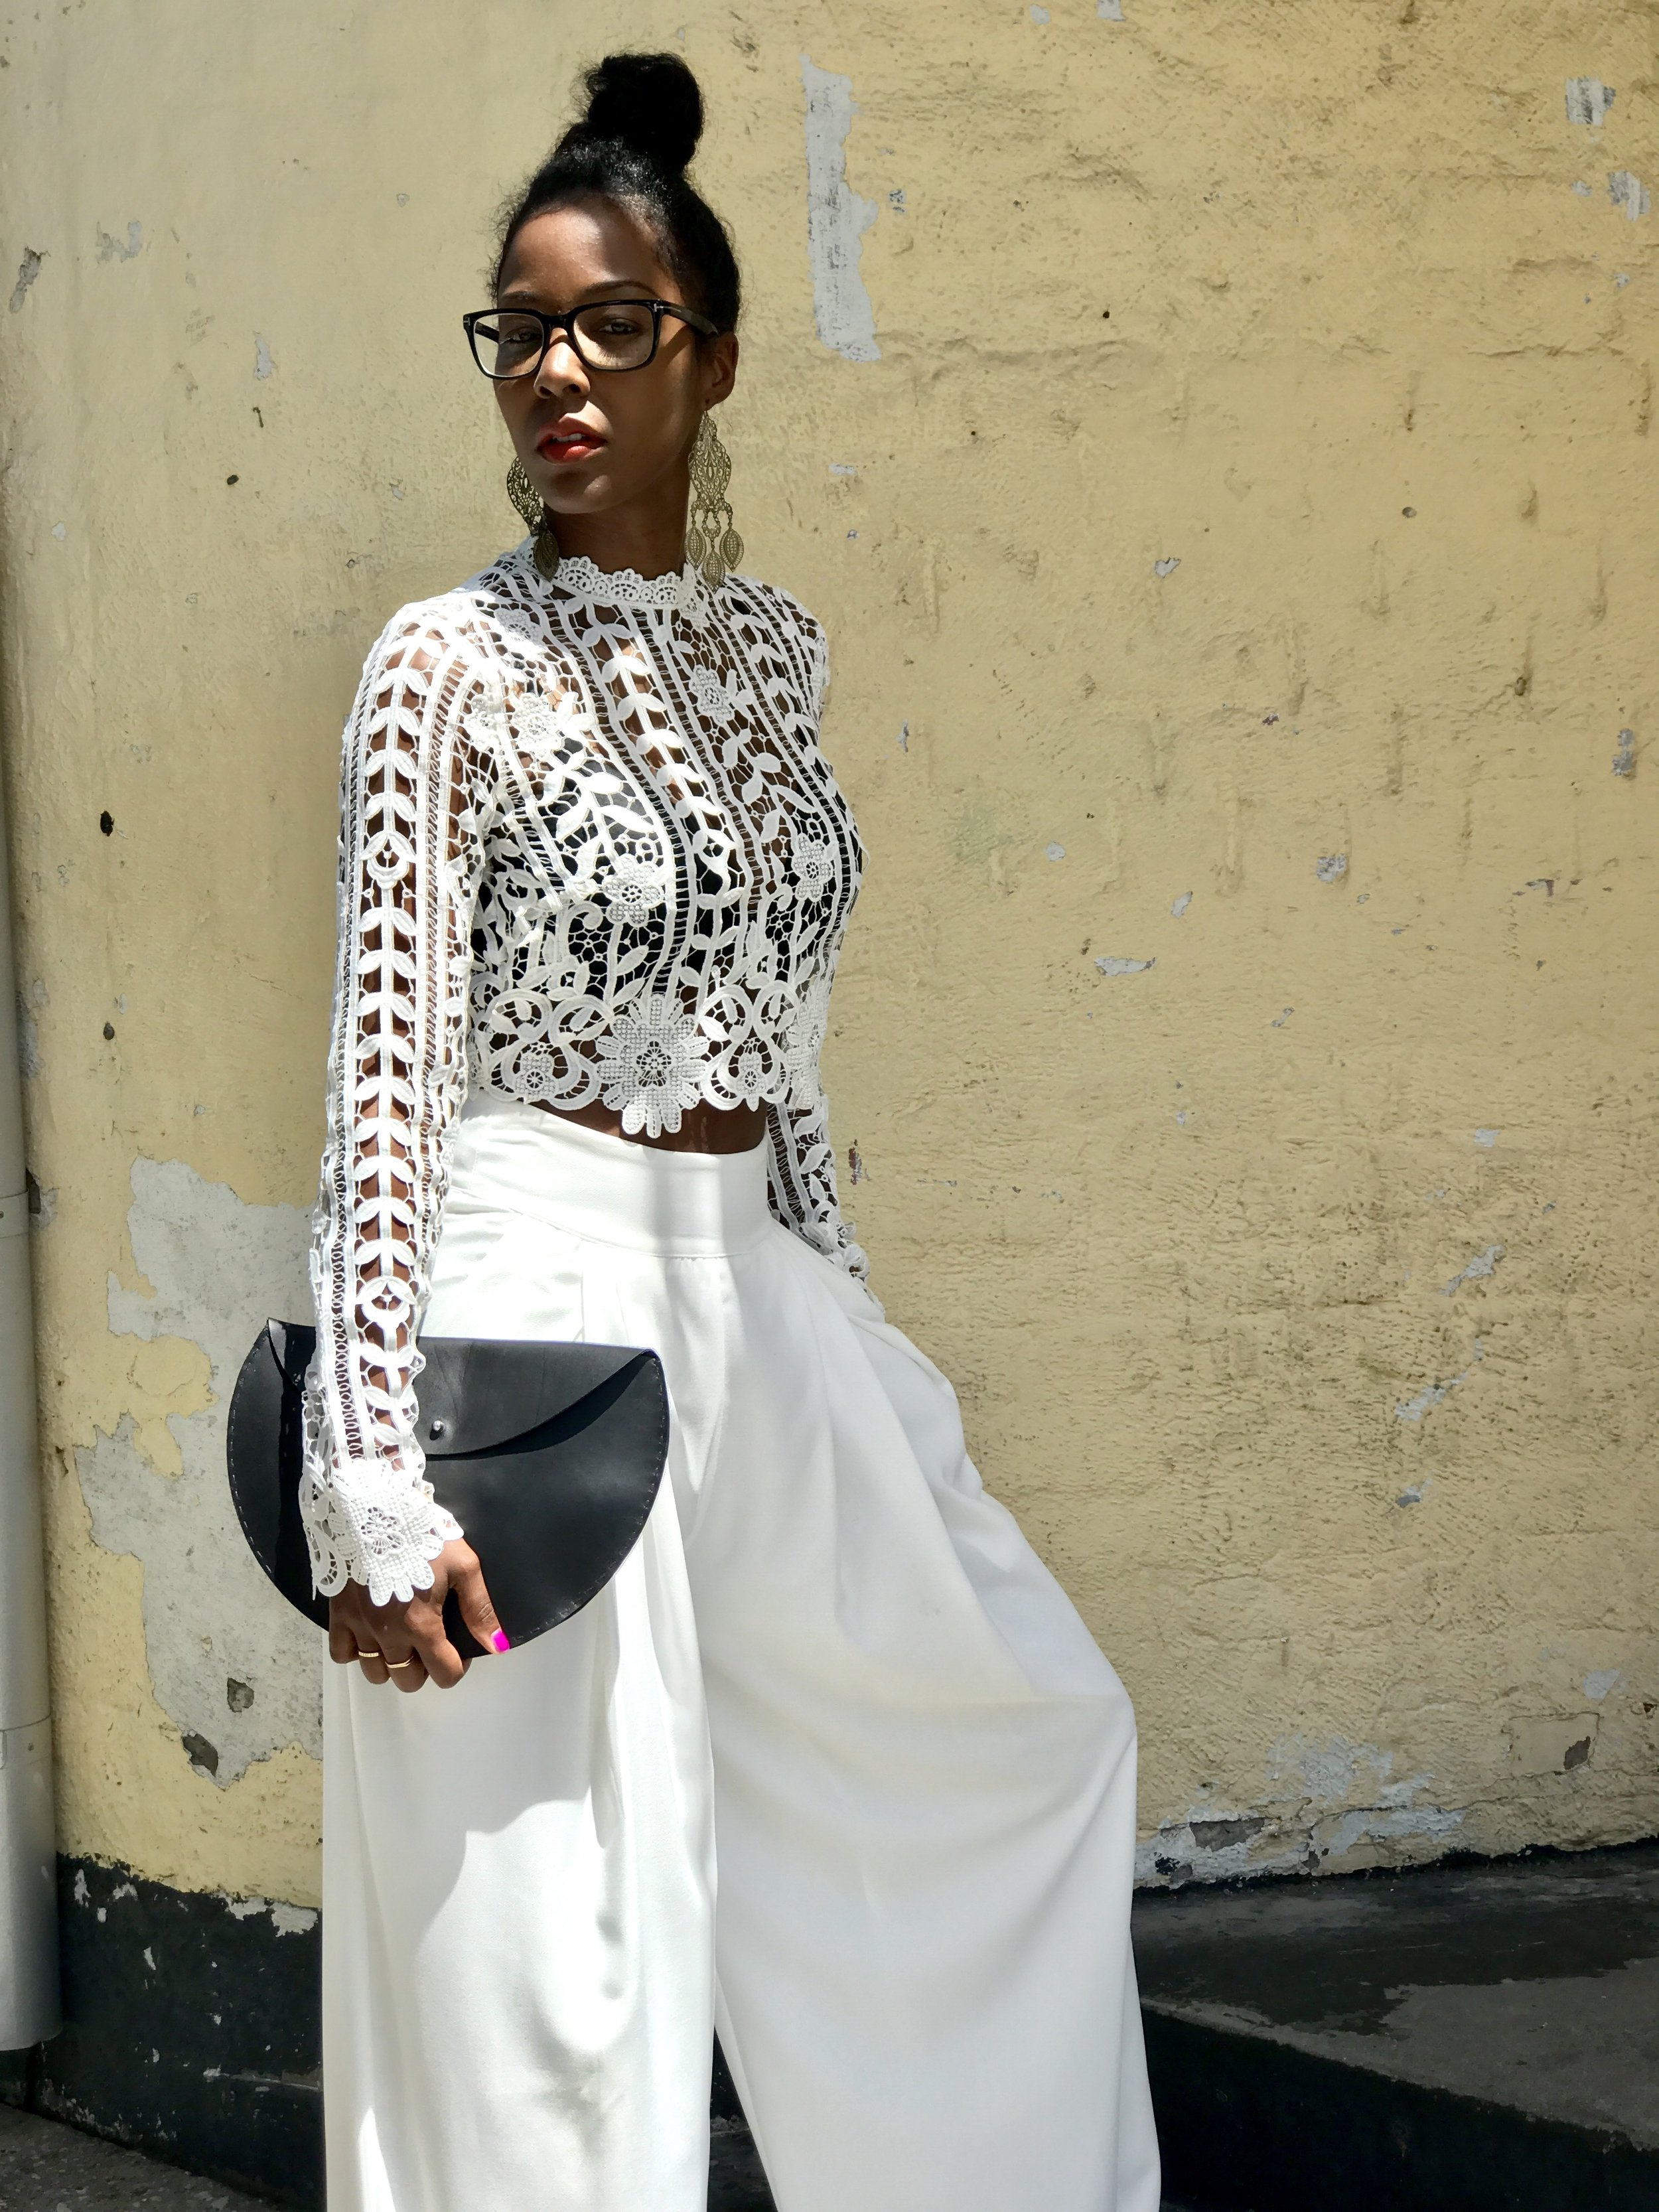 Samjah Iman of Style & Energy